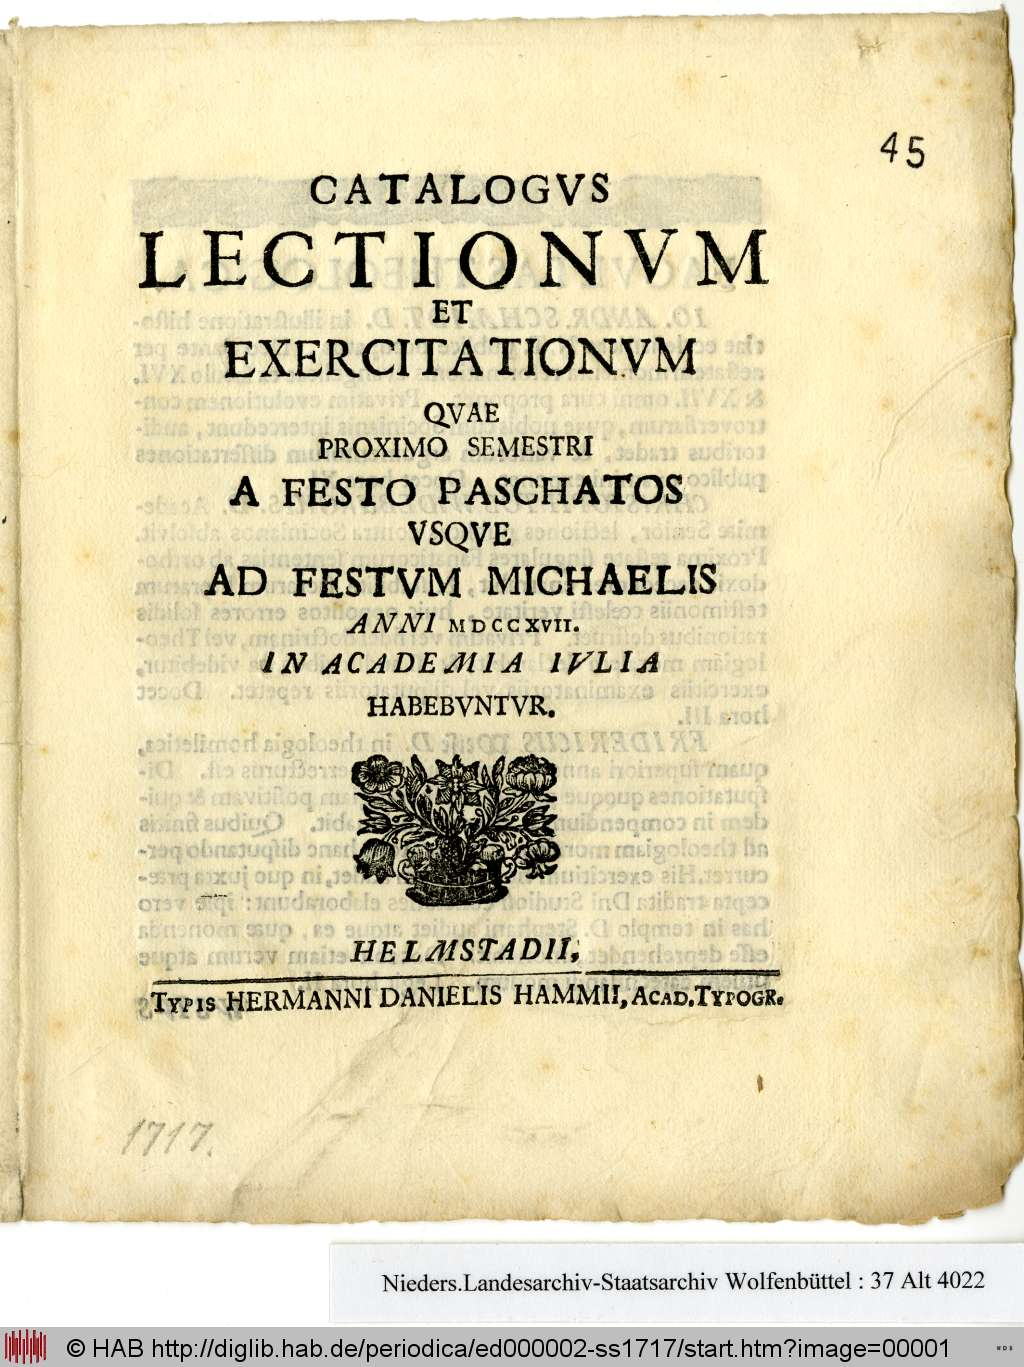 http://diglib.hab.de/periodica/ed000002-ss1717/00001.jpg